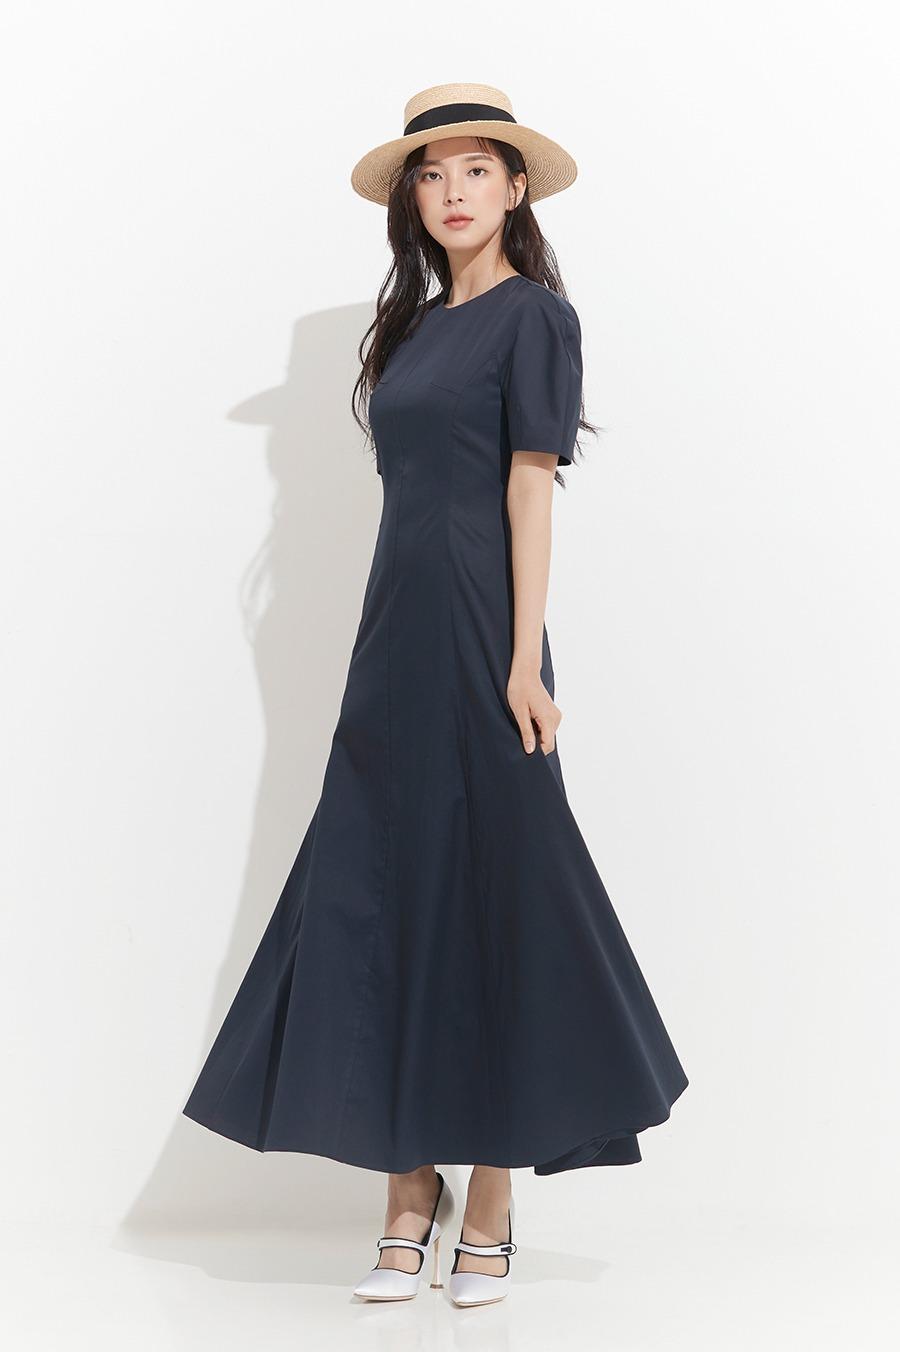 NO.8 DRESS - NAVY